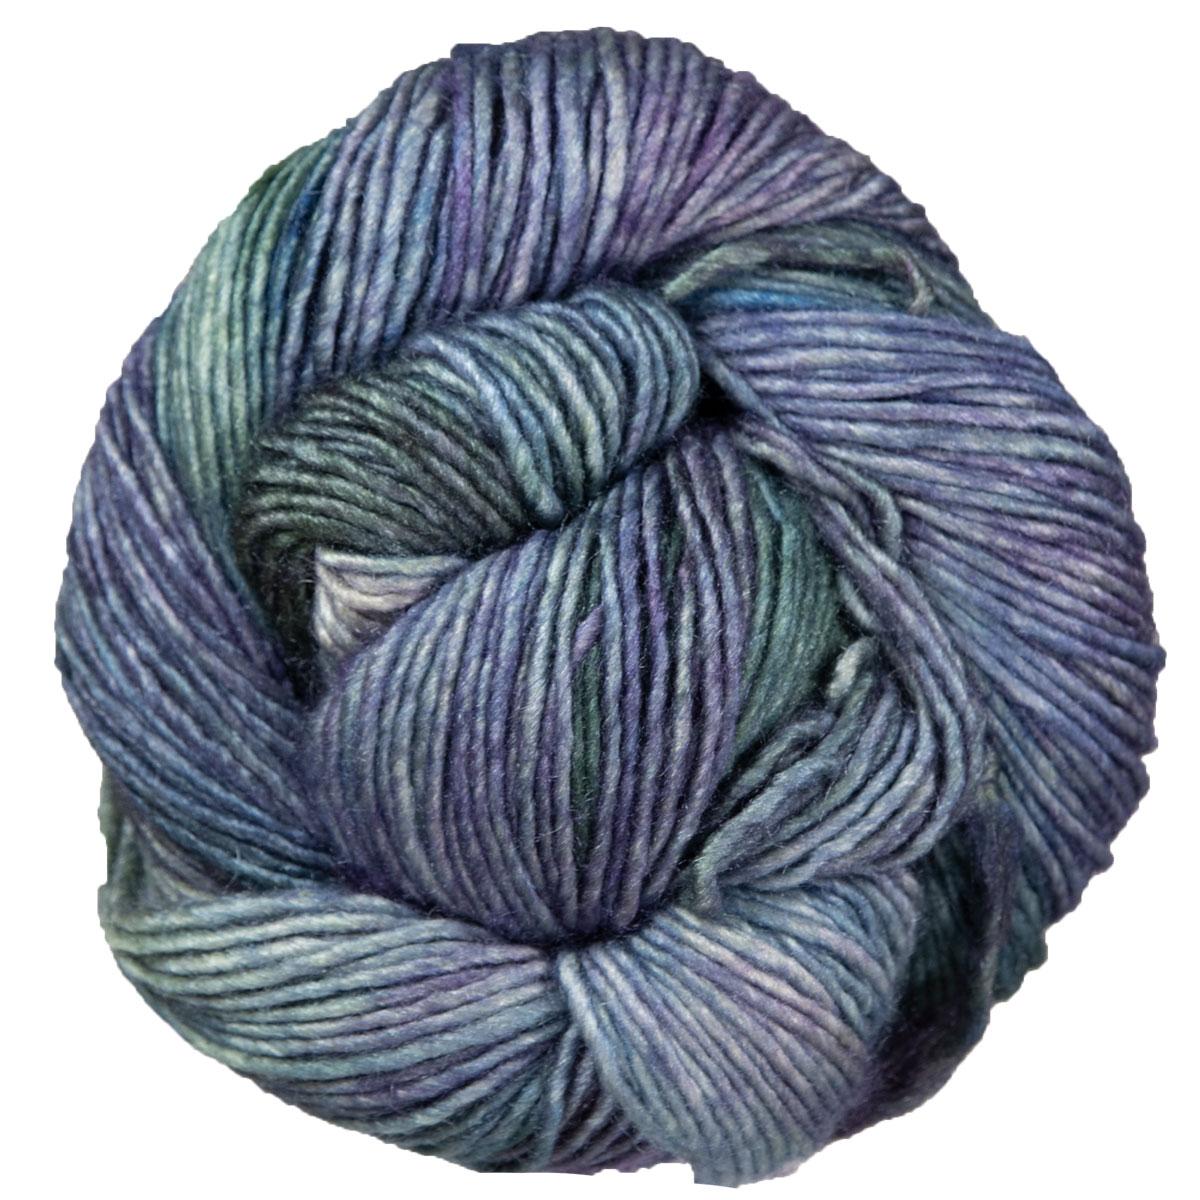 401 Raspberry Malabrigo Silky Merino DK Knitting  Yarn Wool 50g